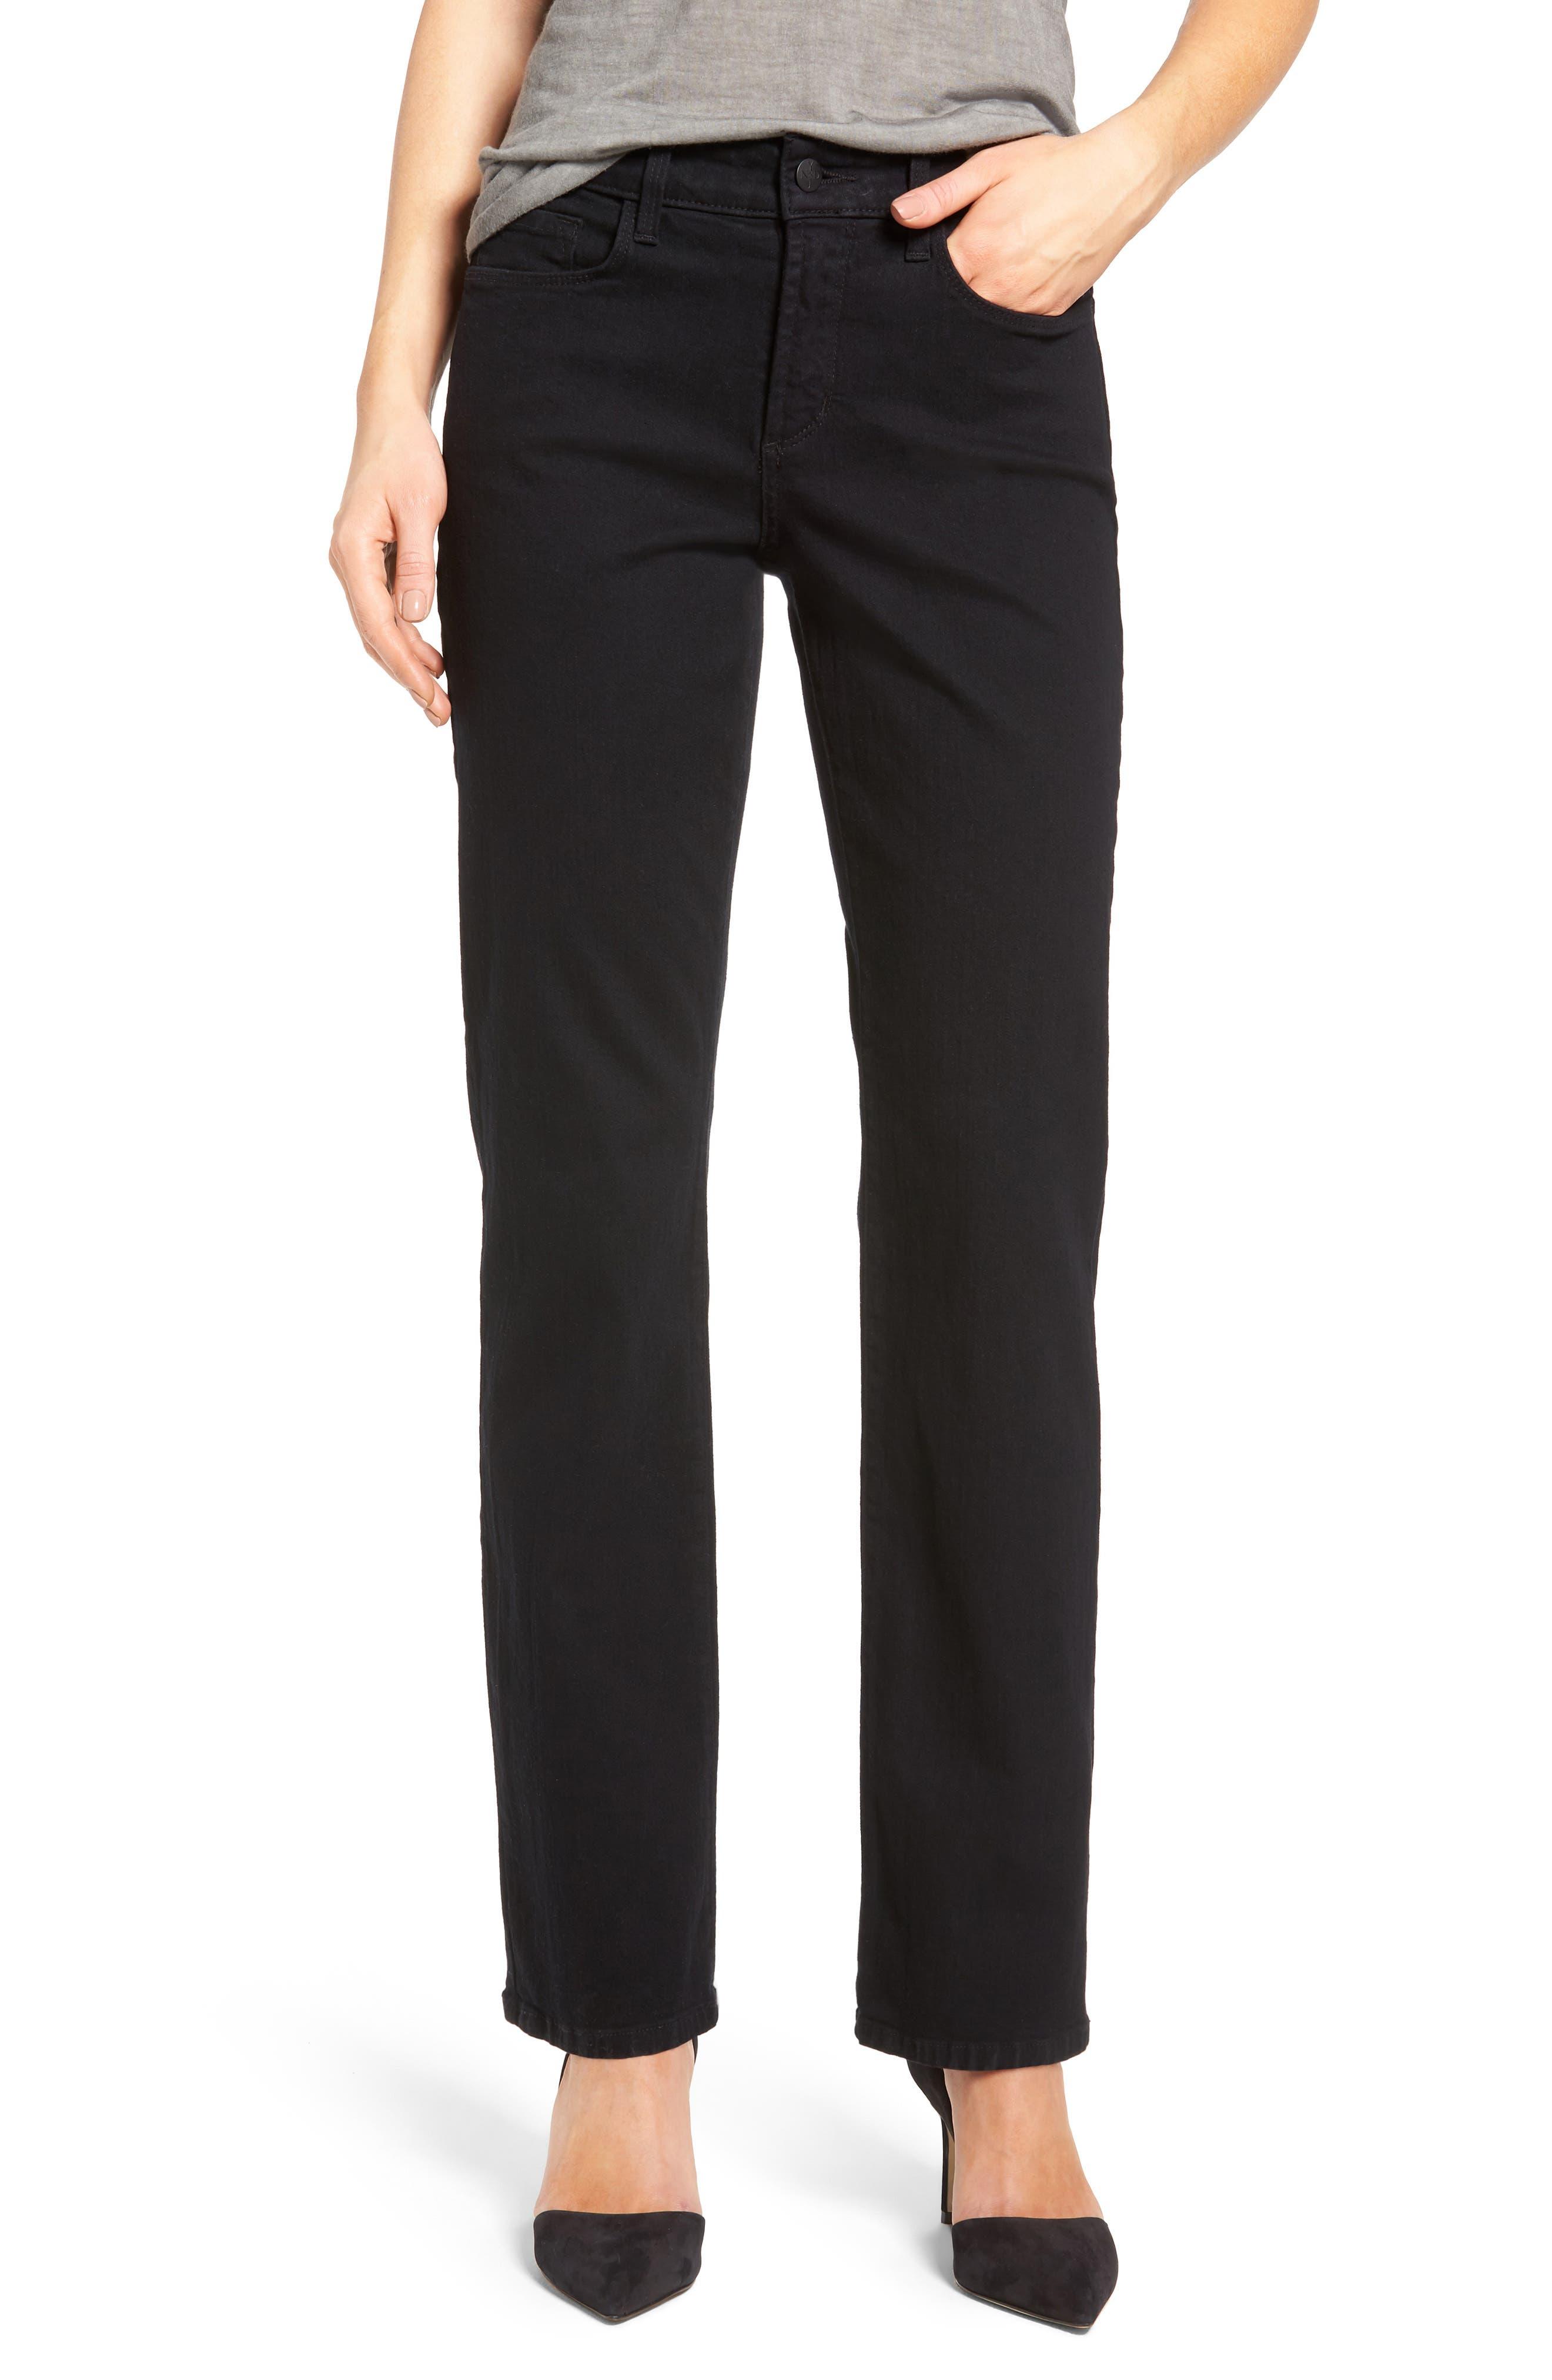 Marilyn Stretch Straight Leg Jeans,                             Main thumbnail 1, color,                             Black